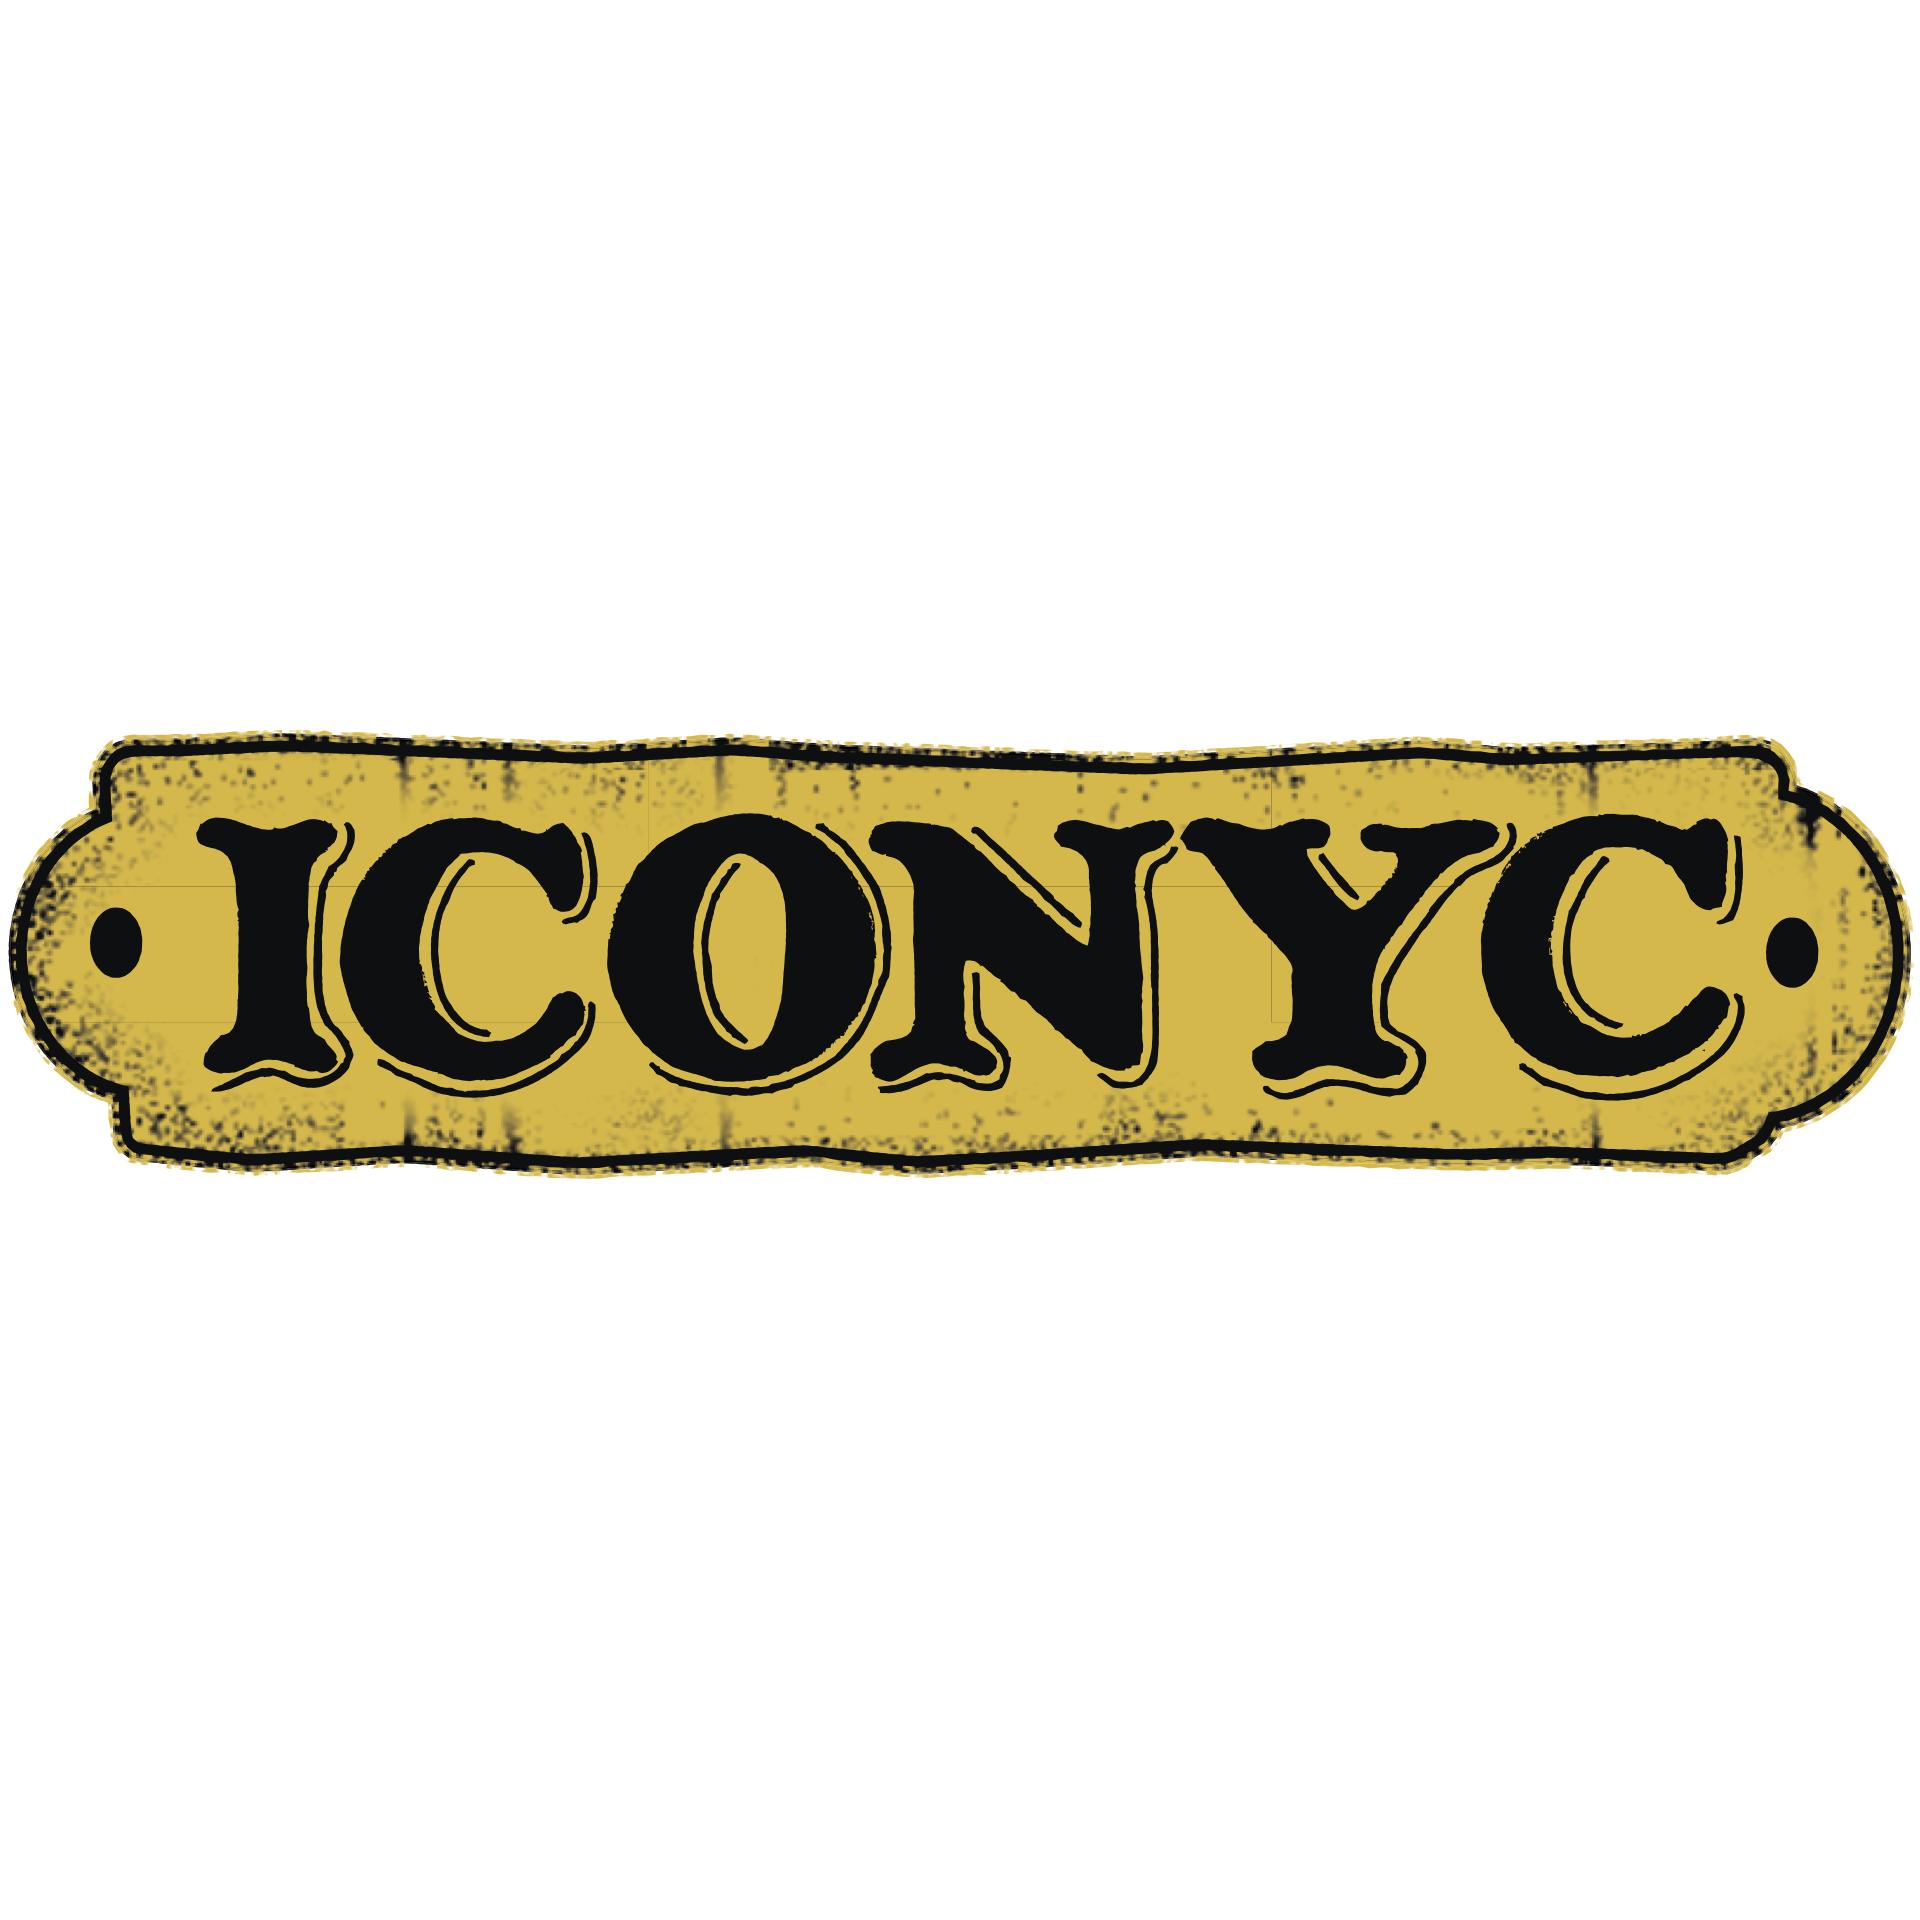 ICONYC Crema Blonde beer Label Full Size